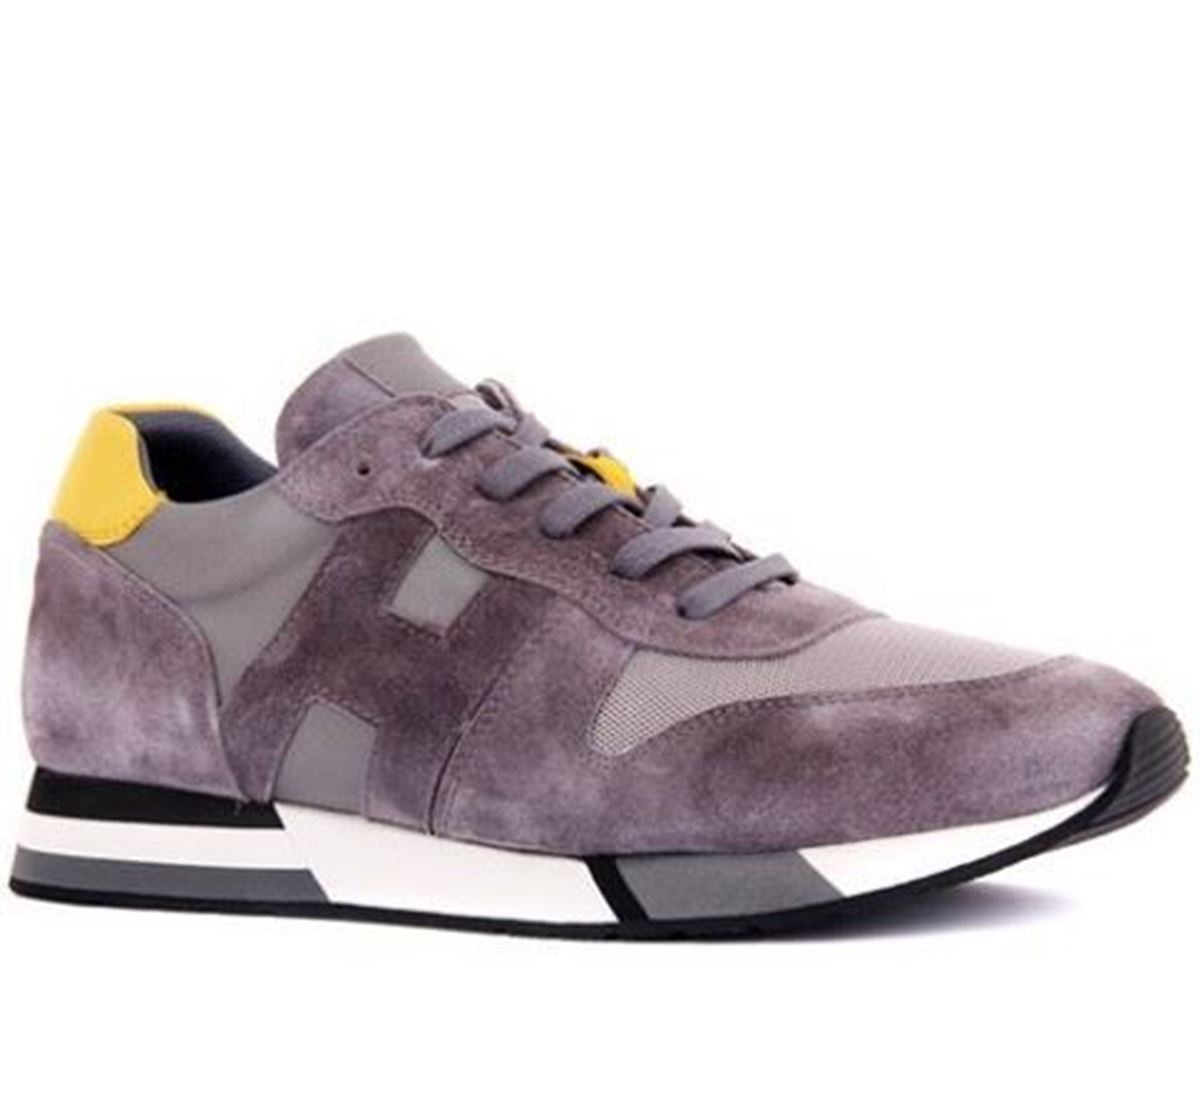 صورة Sail Lakers - Gri Süet Erkek Deri Sneaker